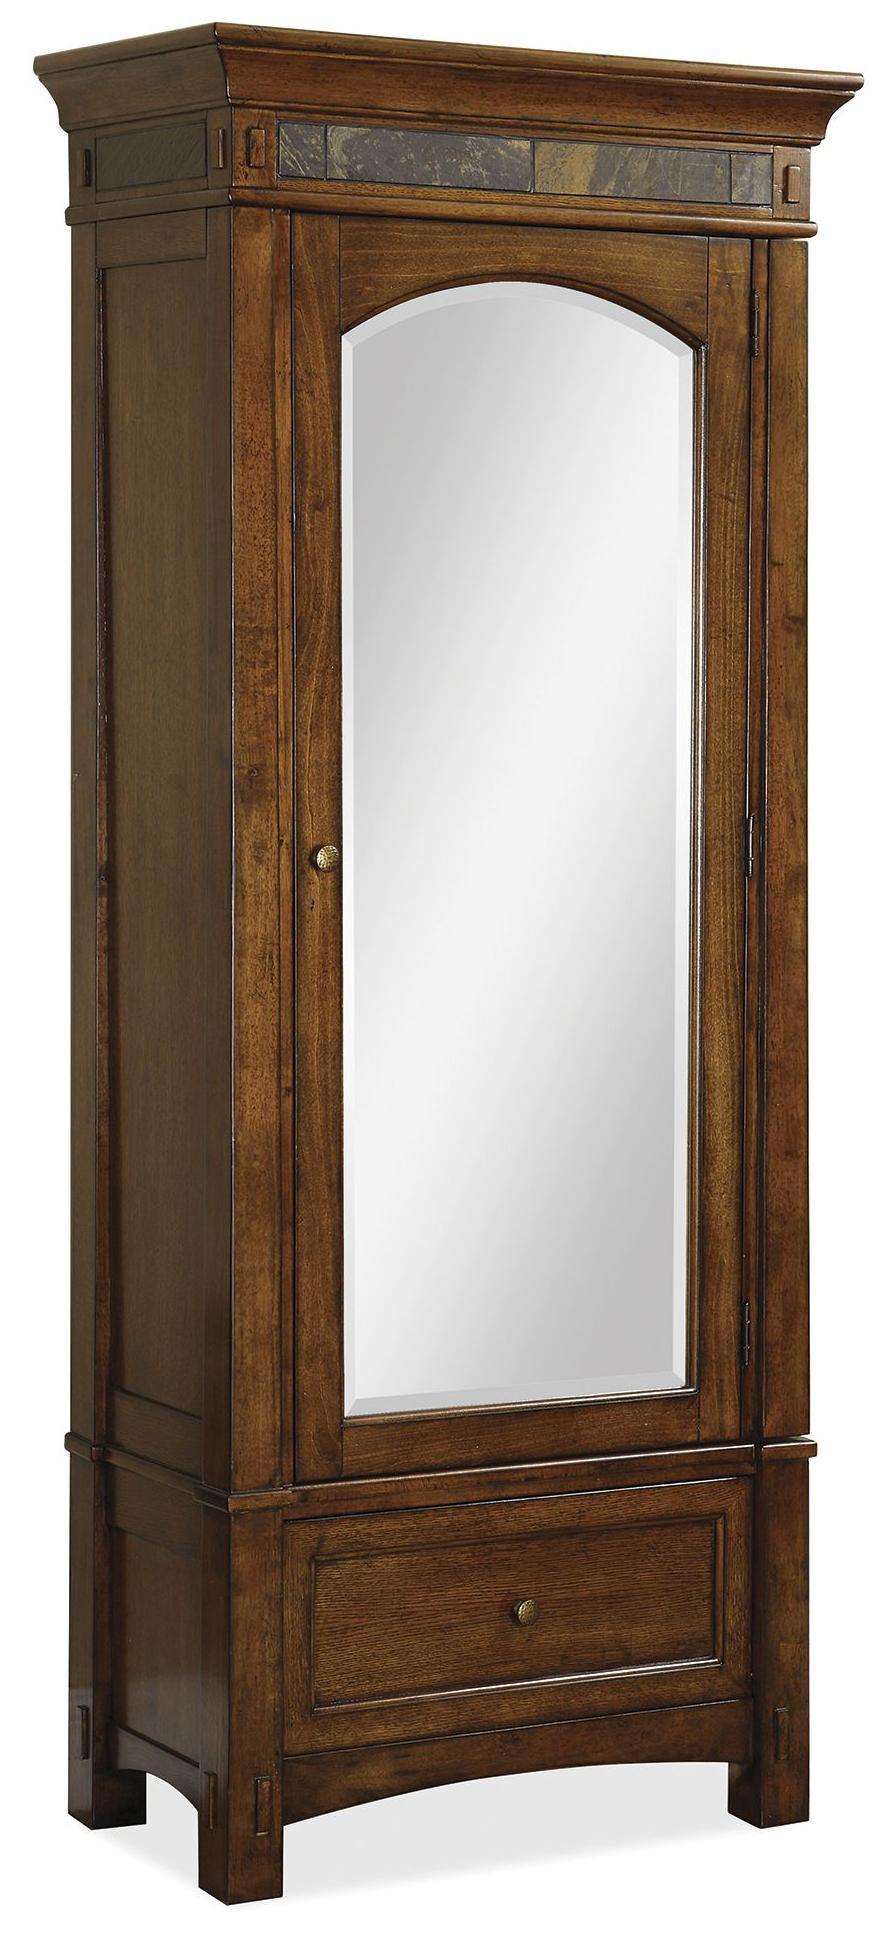 Riverside Furniture Craftsman Home Wardrobe - Item Number: 2966